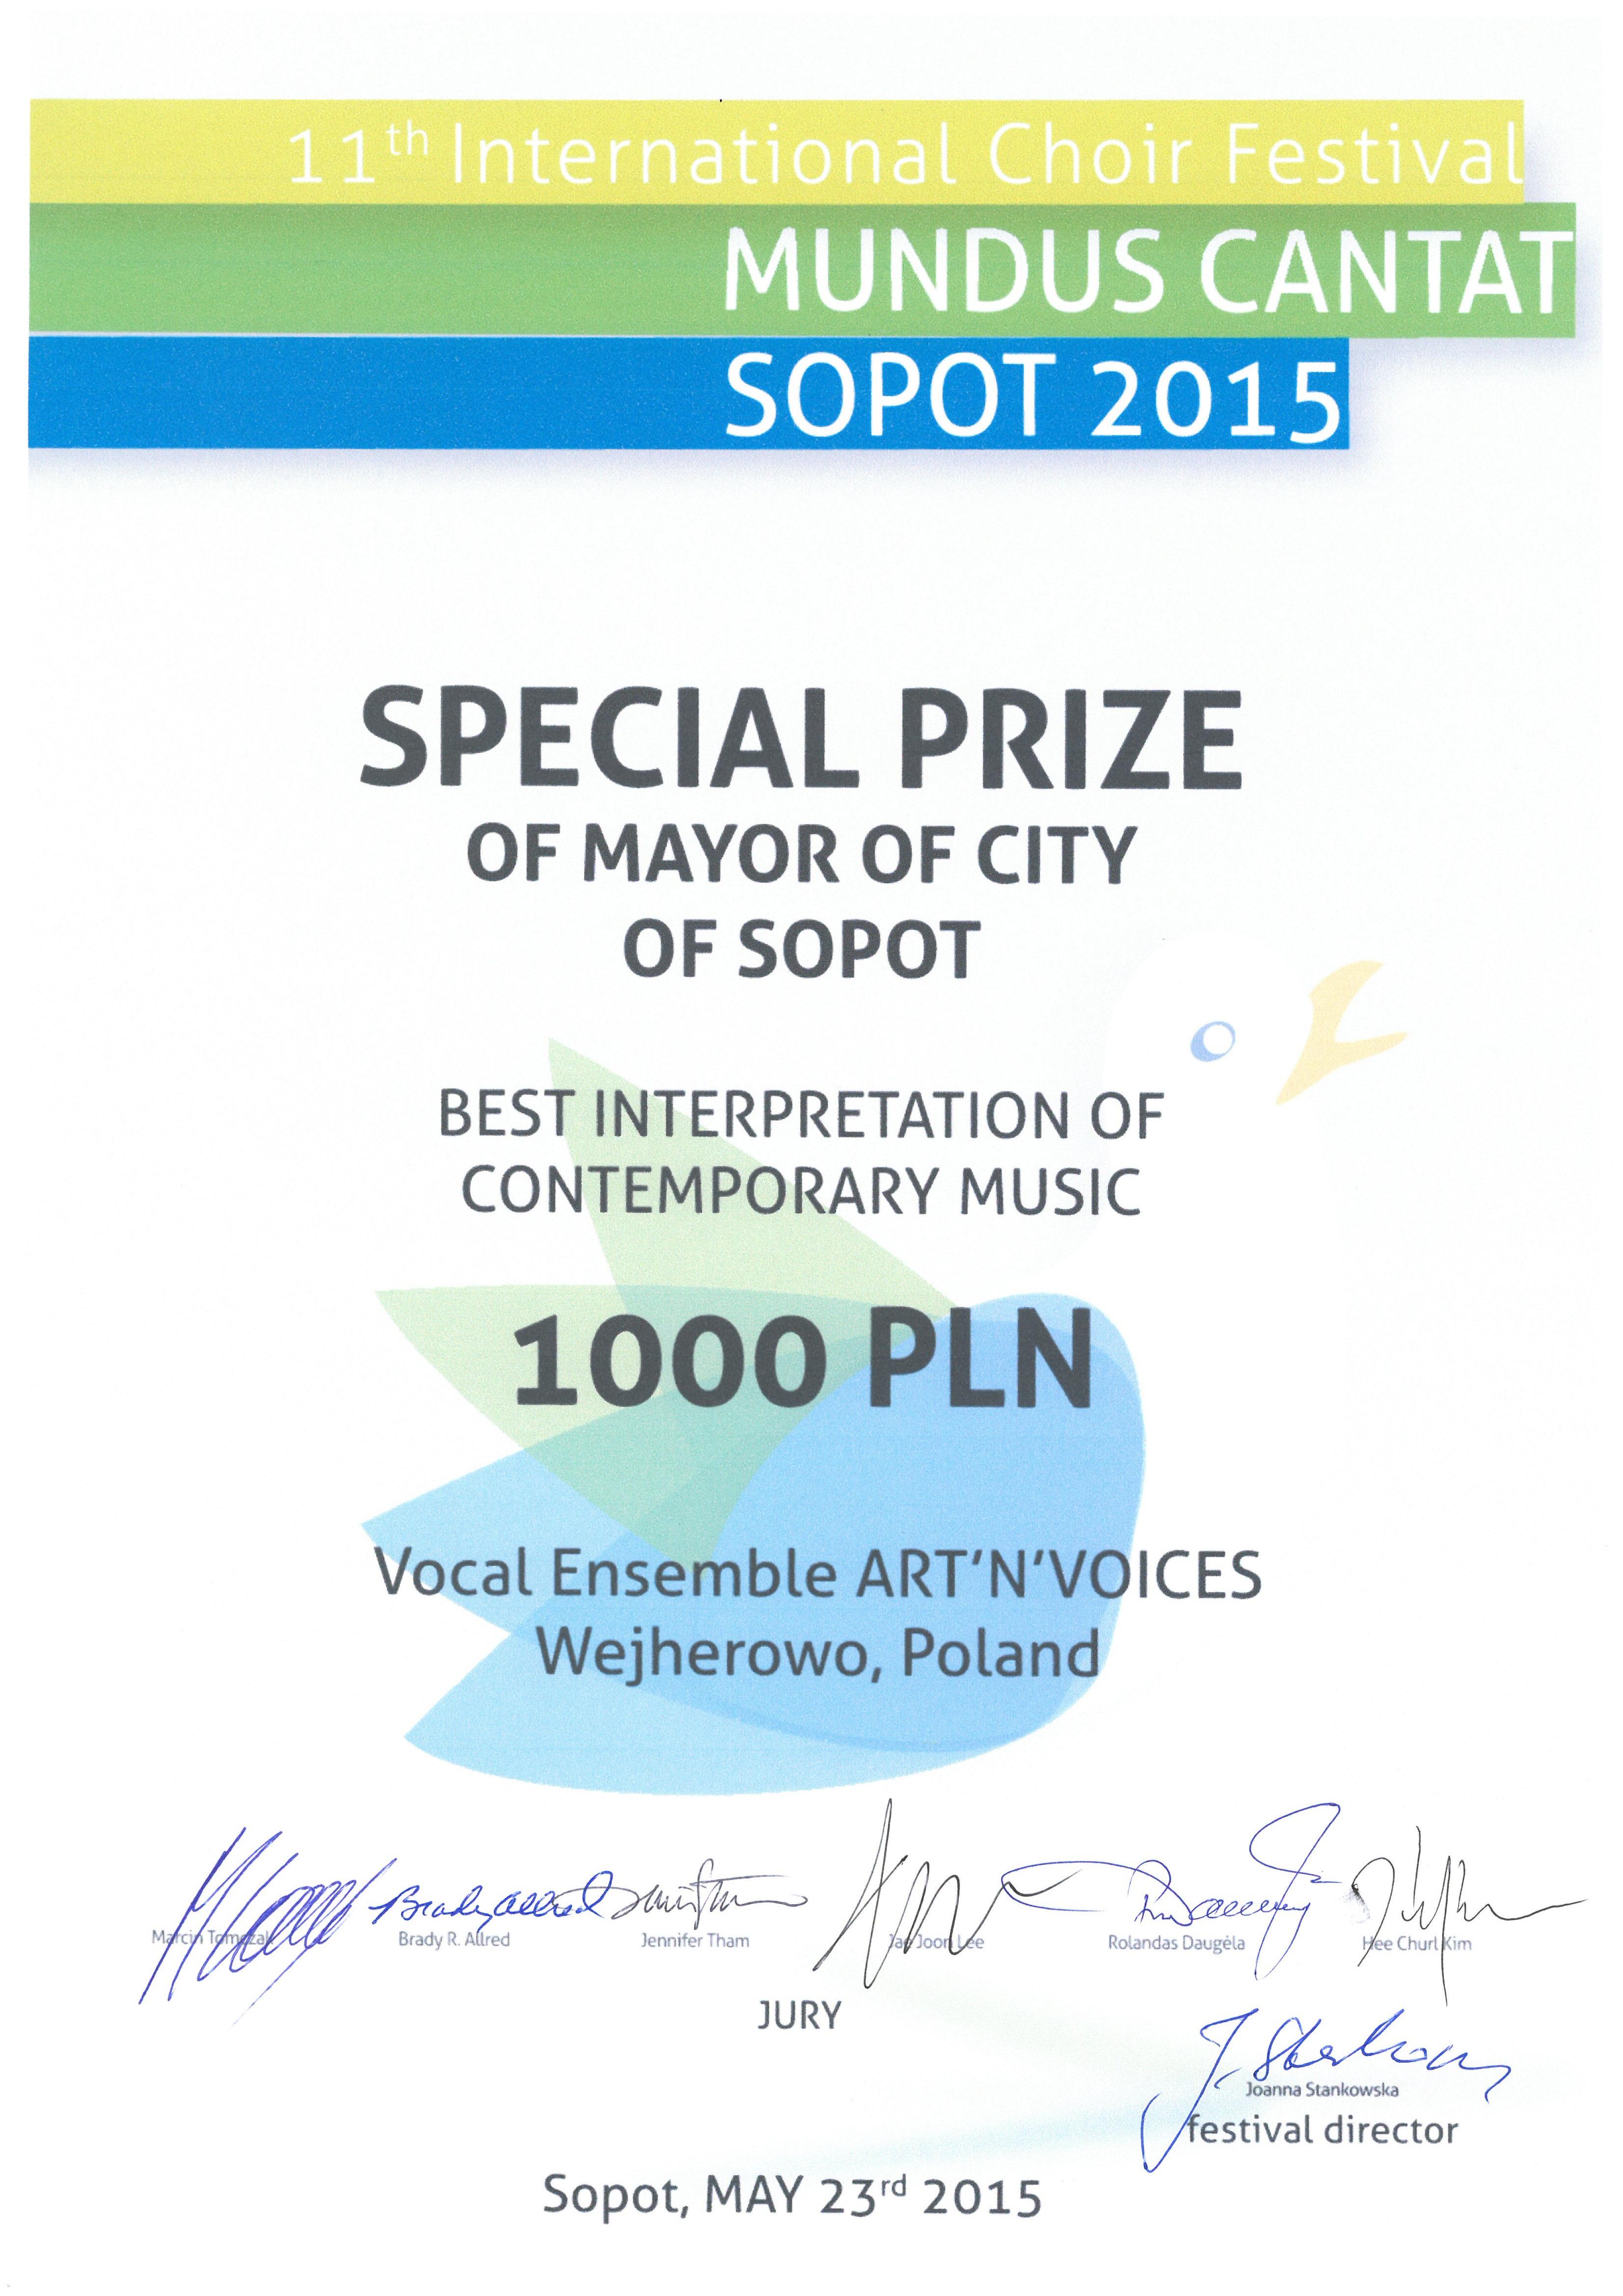 Nagroda Specjalna_Art'n'Voices_Mundus Cantat_2015